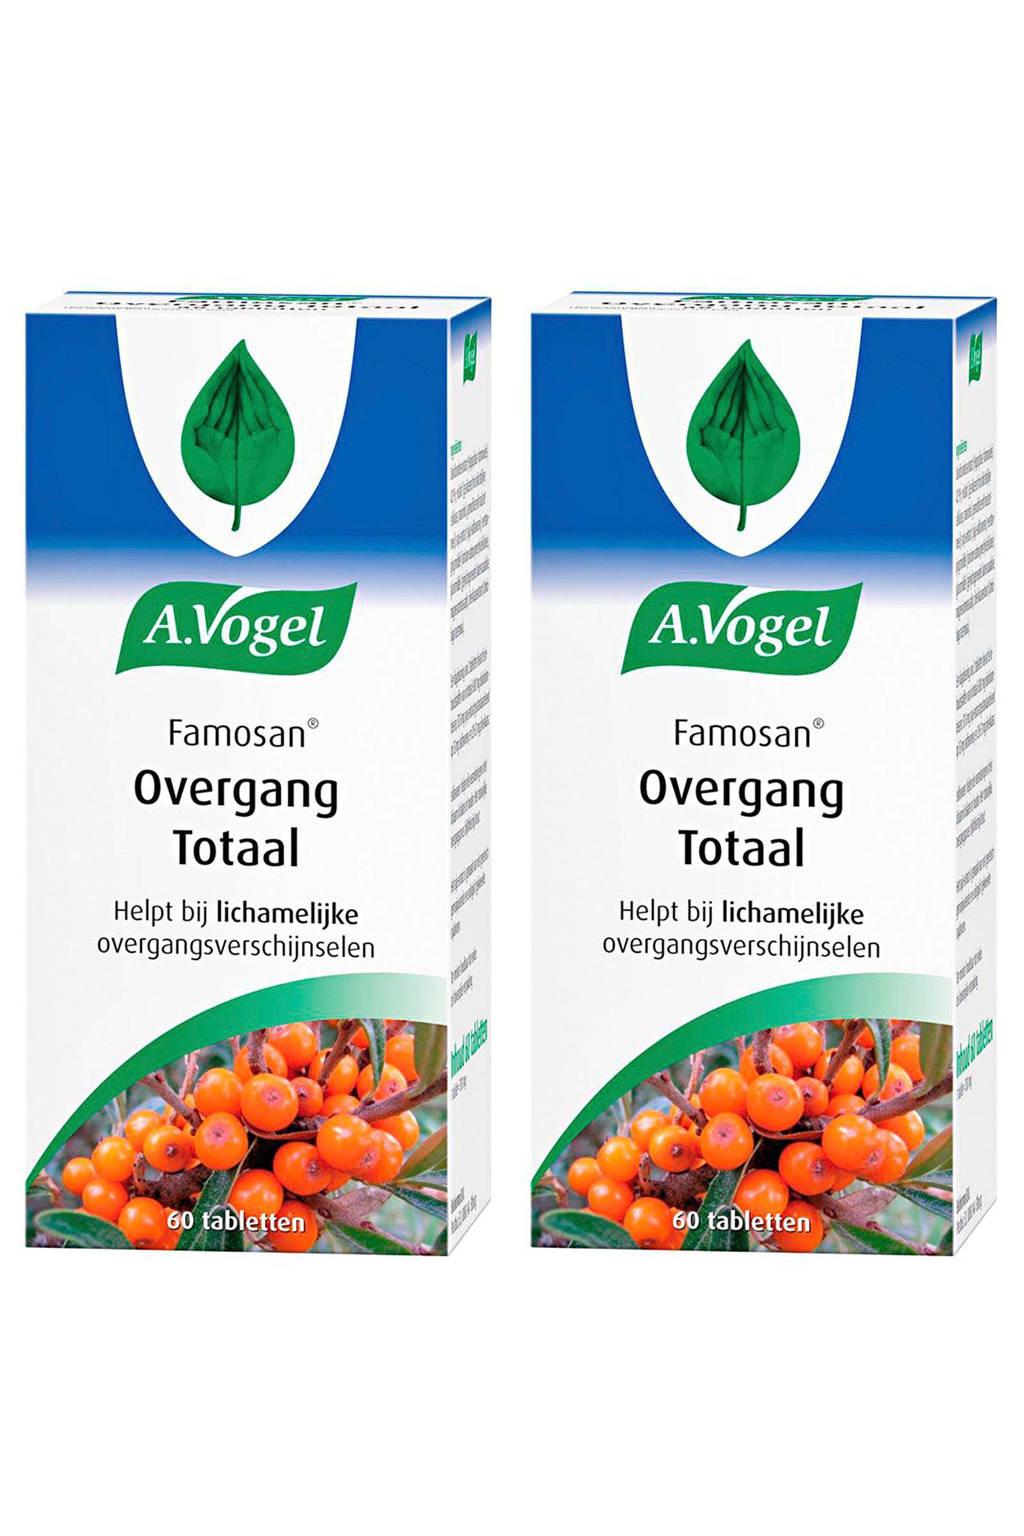 A.Vogel Famosan Overgang Totaal - 2x 60 tabletten